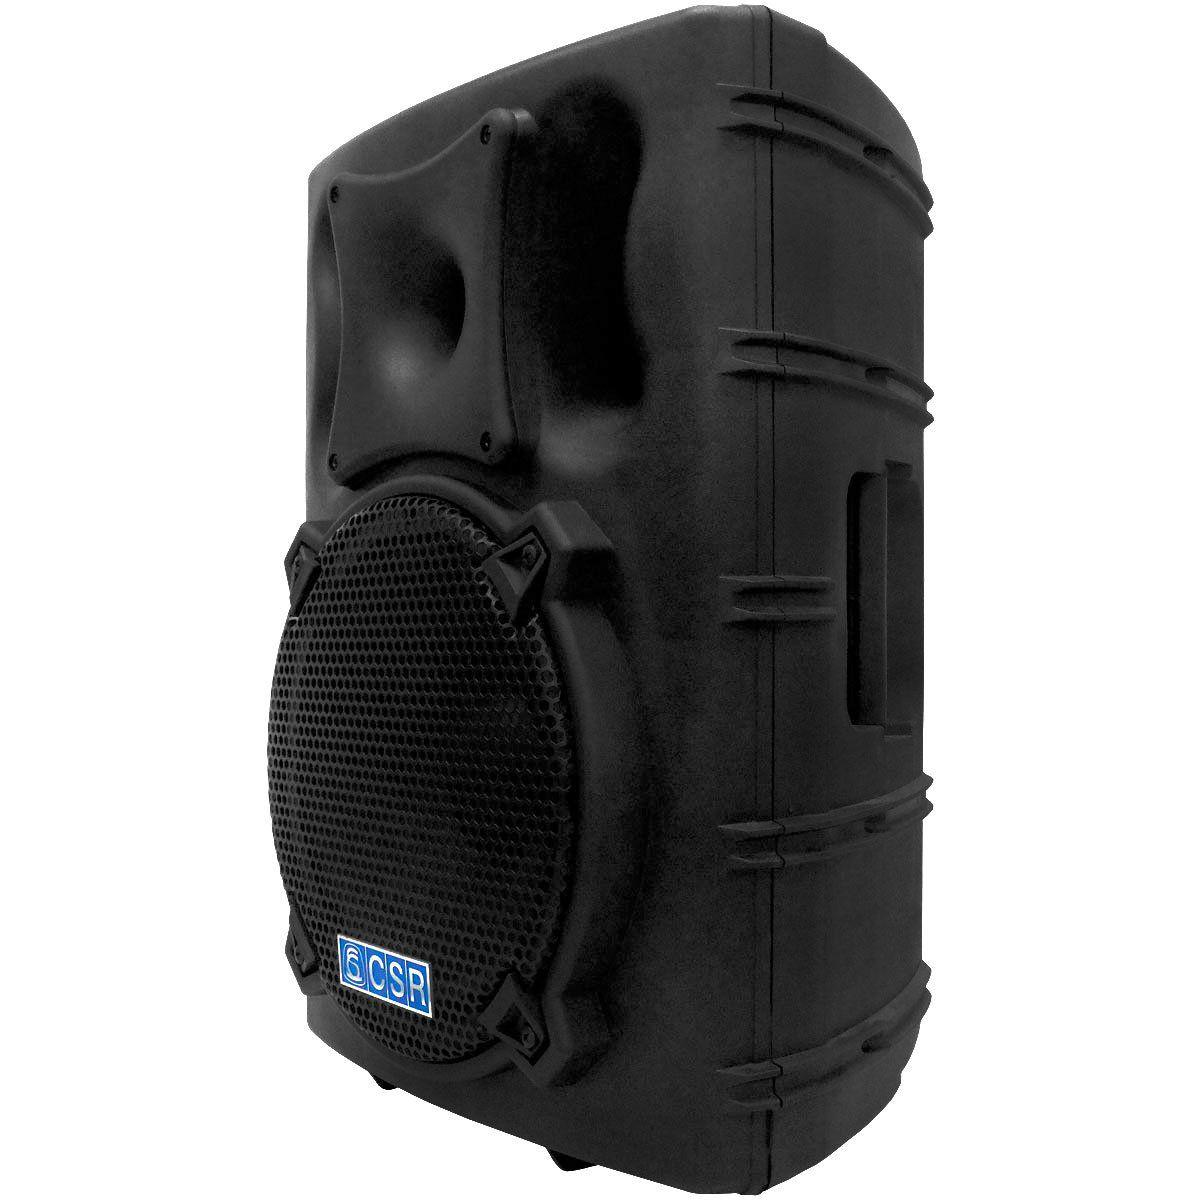 Caixa Amplificada CSR 3000 A de 12 Polegadas 200w c/ 3 Entradas + Echo